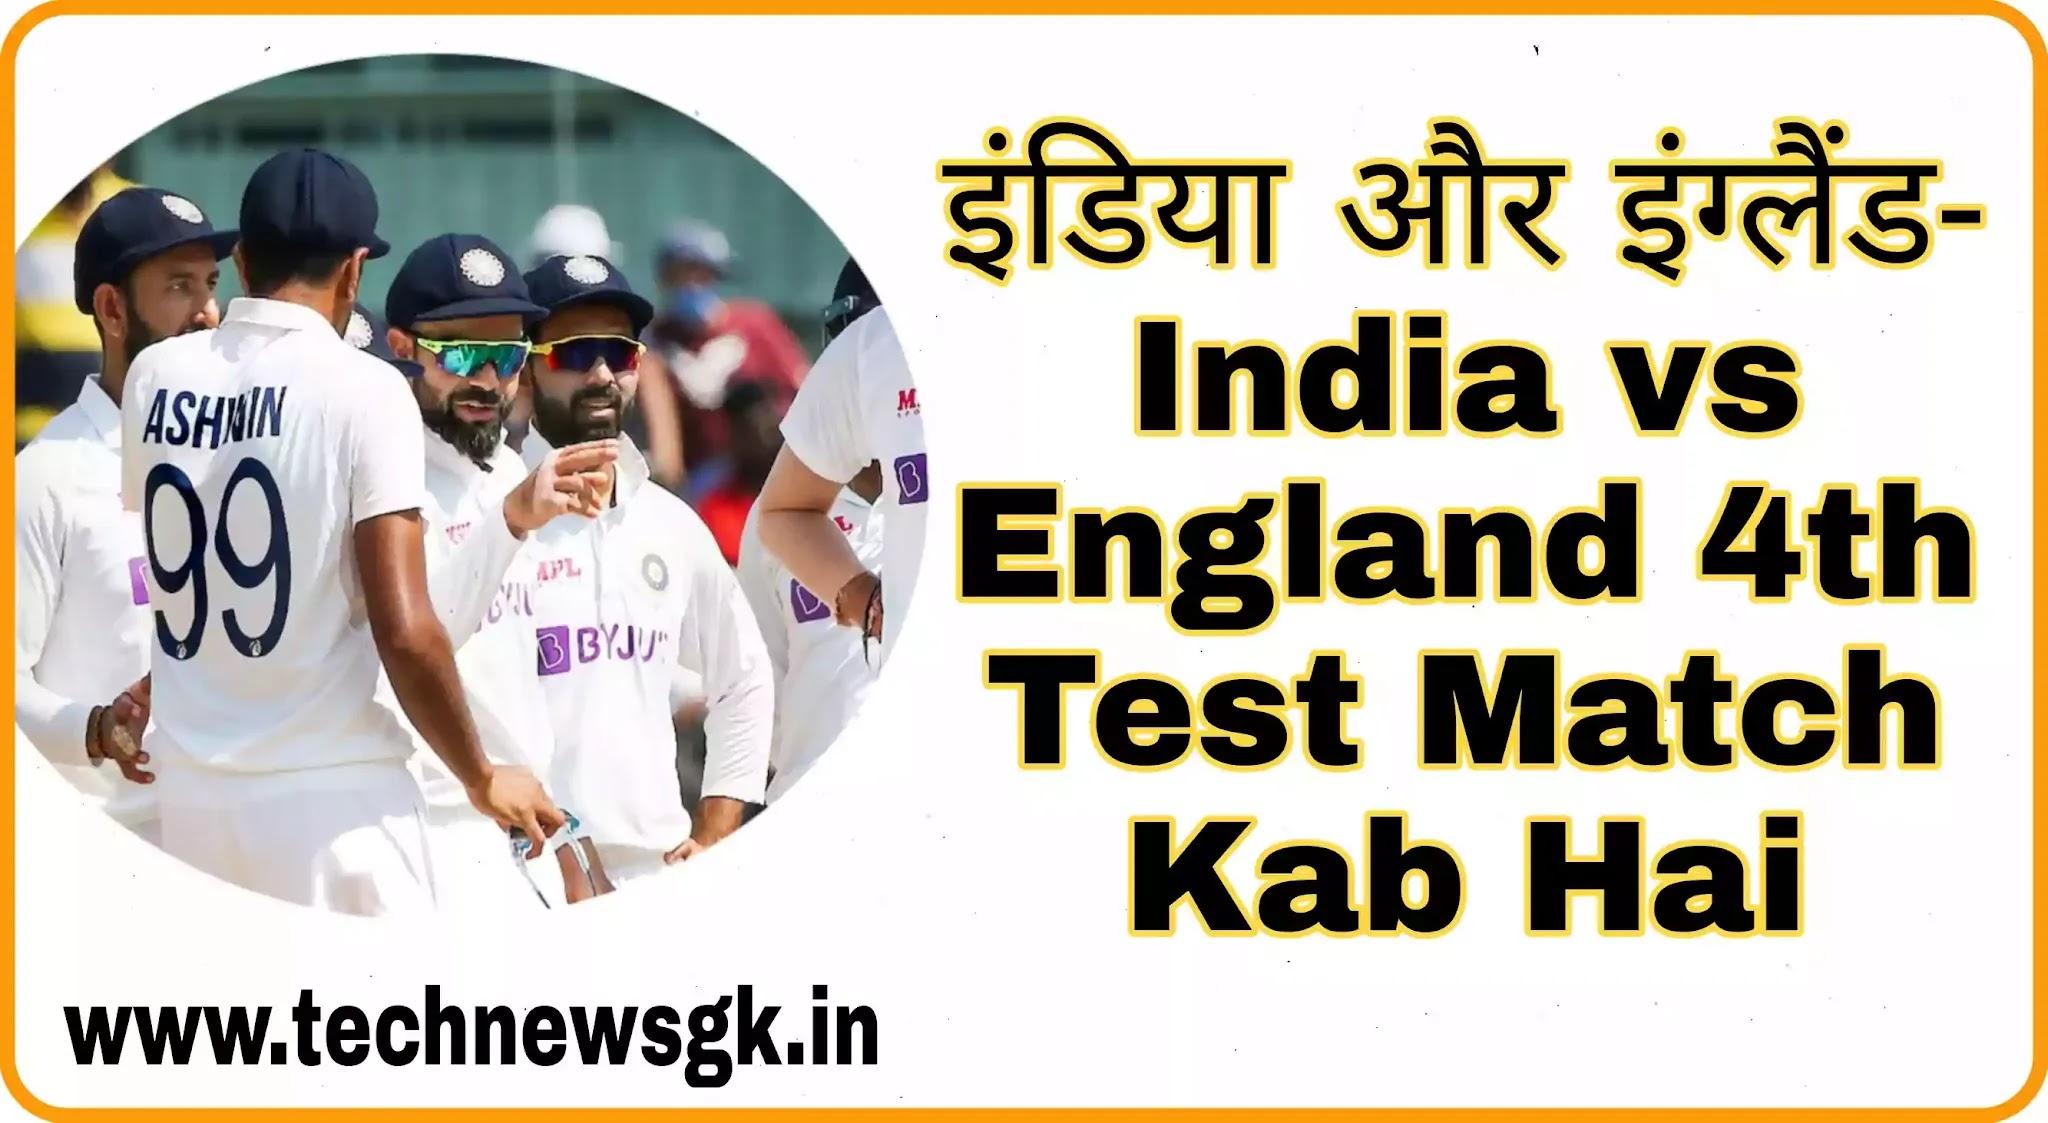 India vs England 4th Test Match Kab Hai 2021